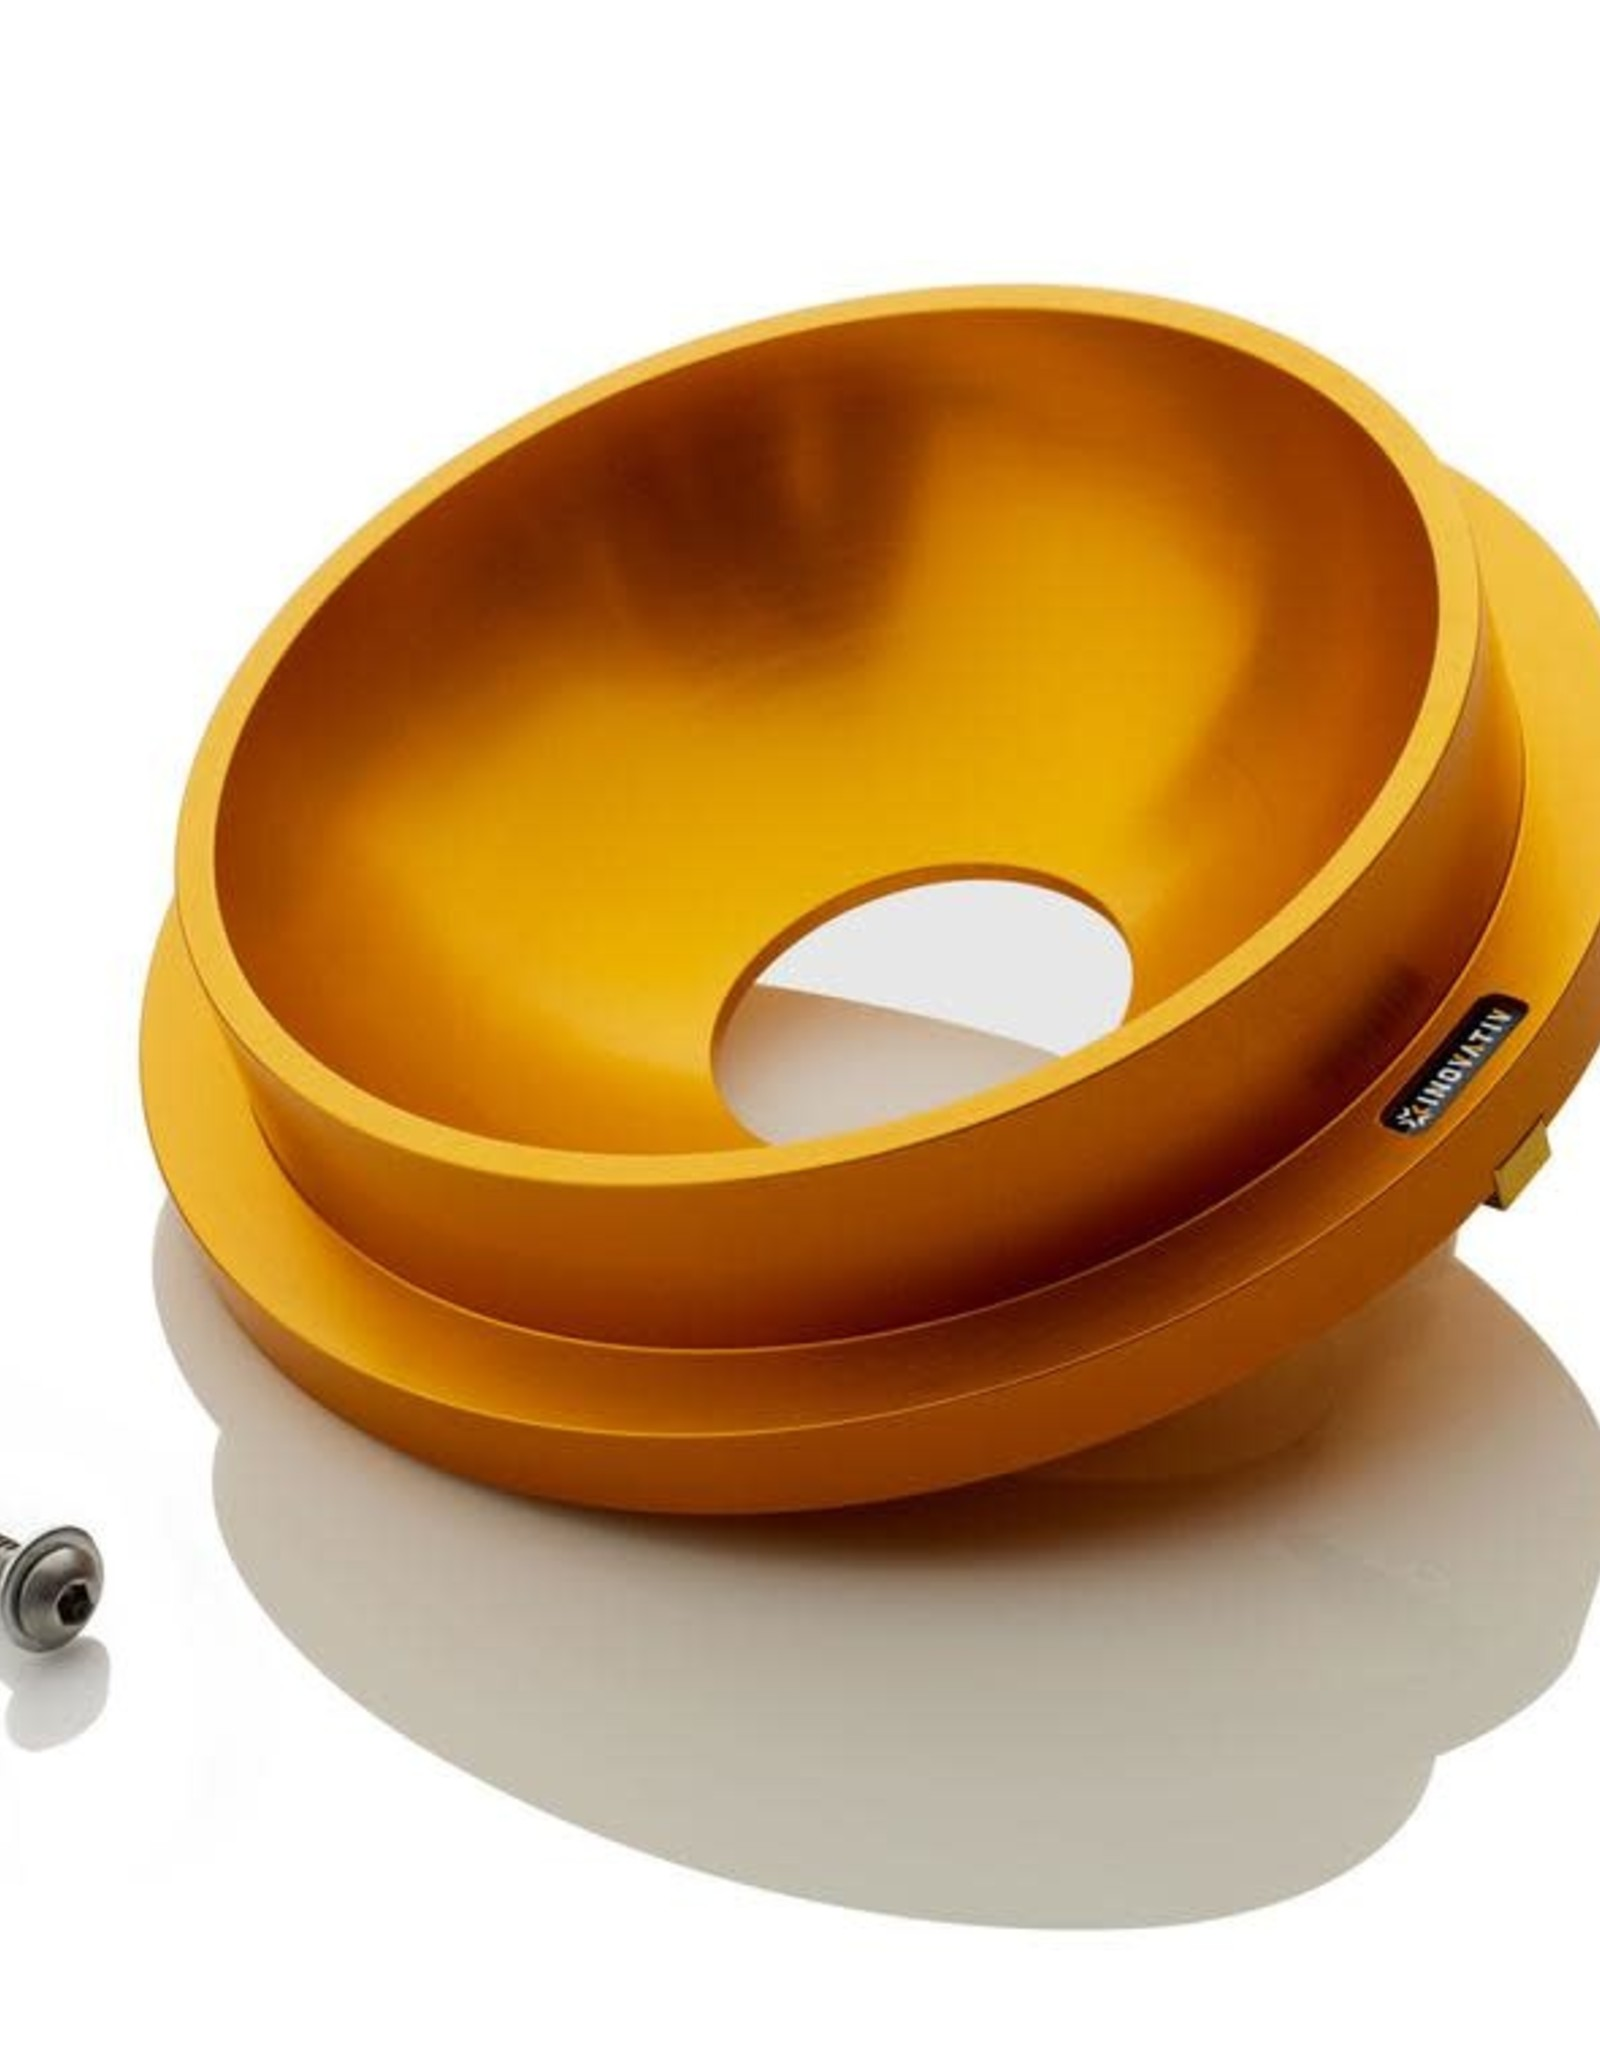 Inovativ Inovativ 150MM BALL PLATE AND HARDWARE